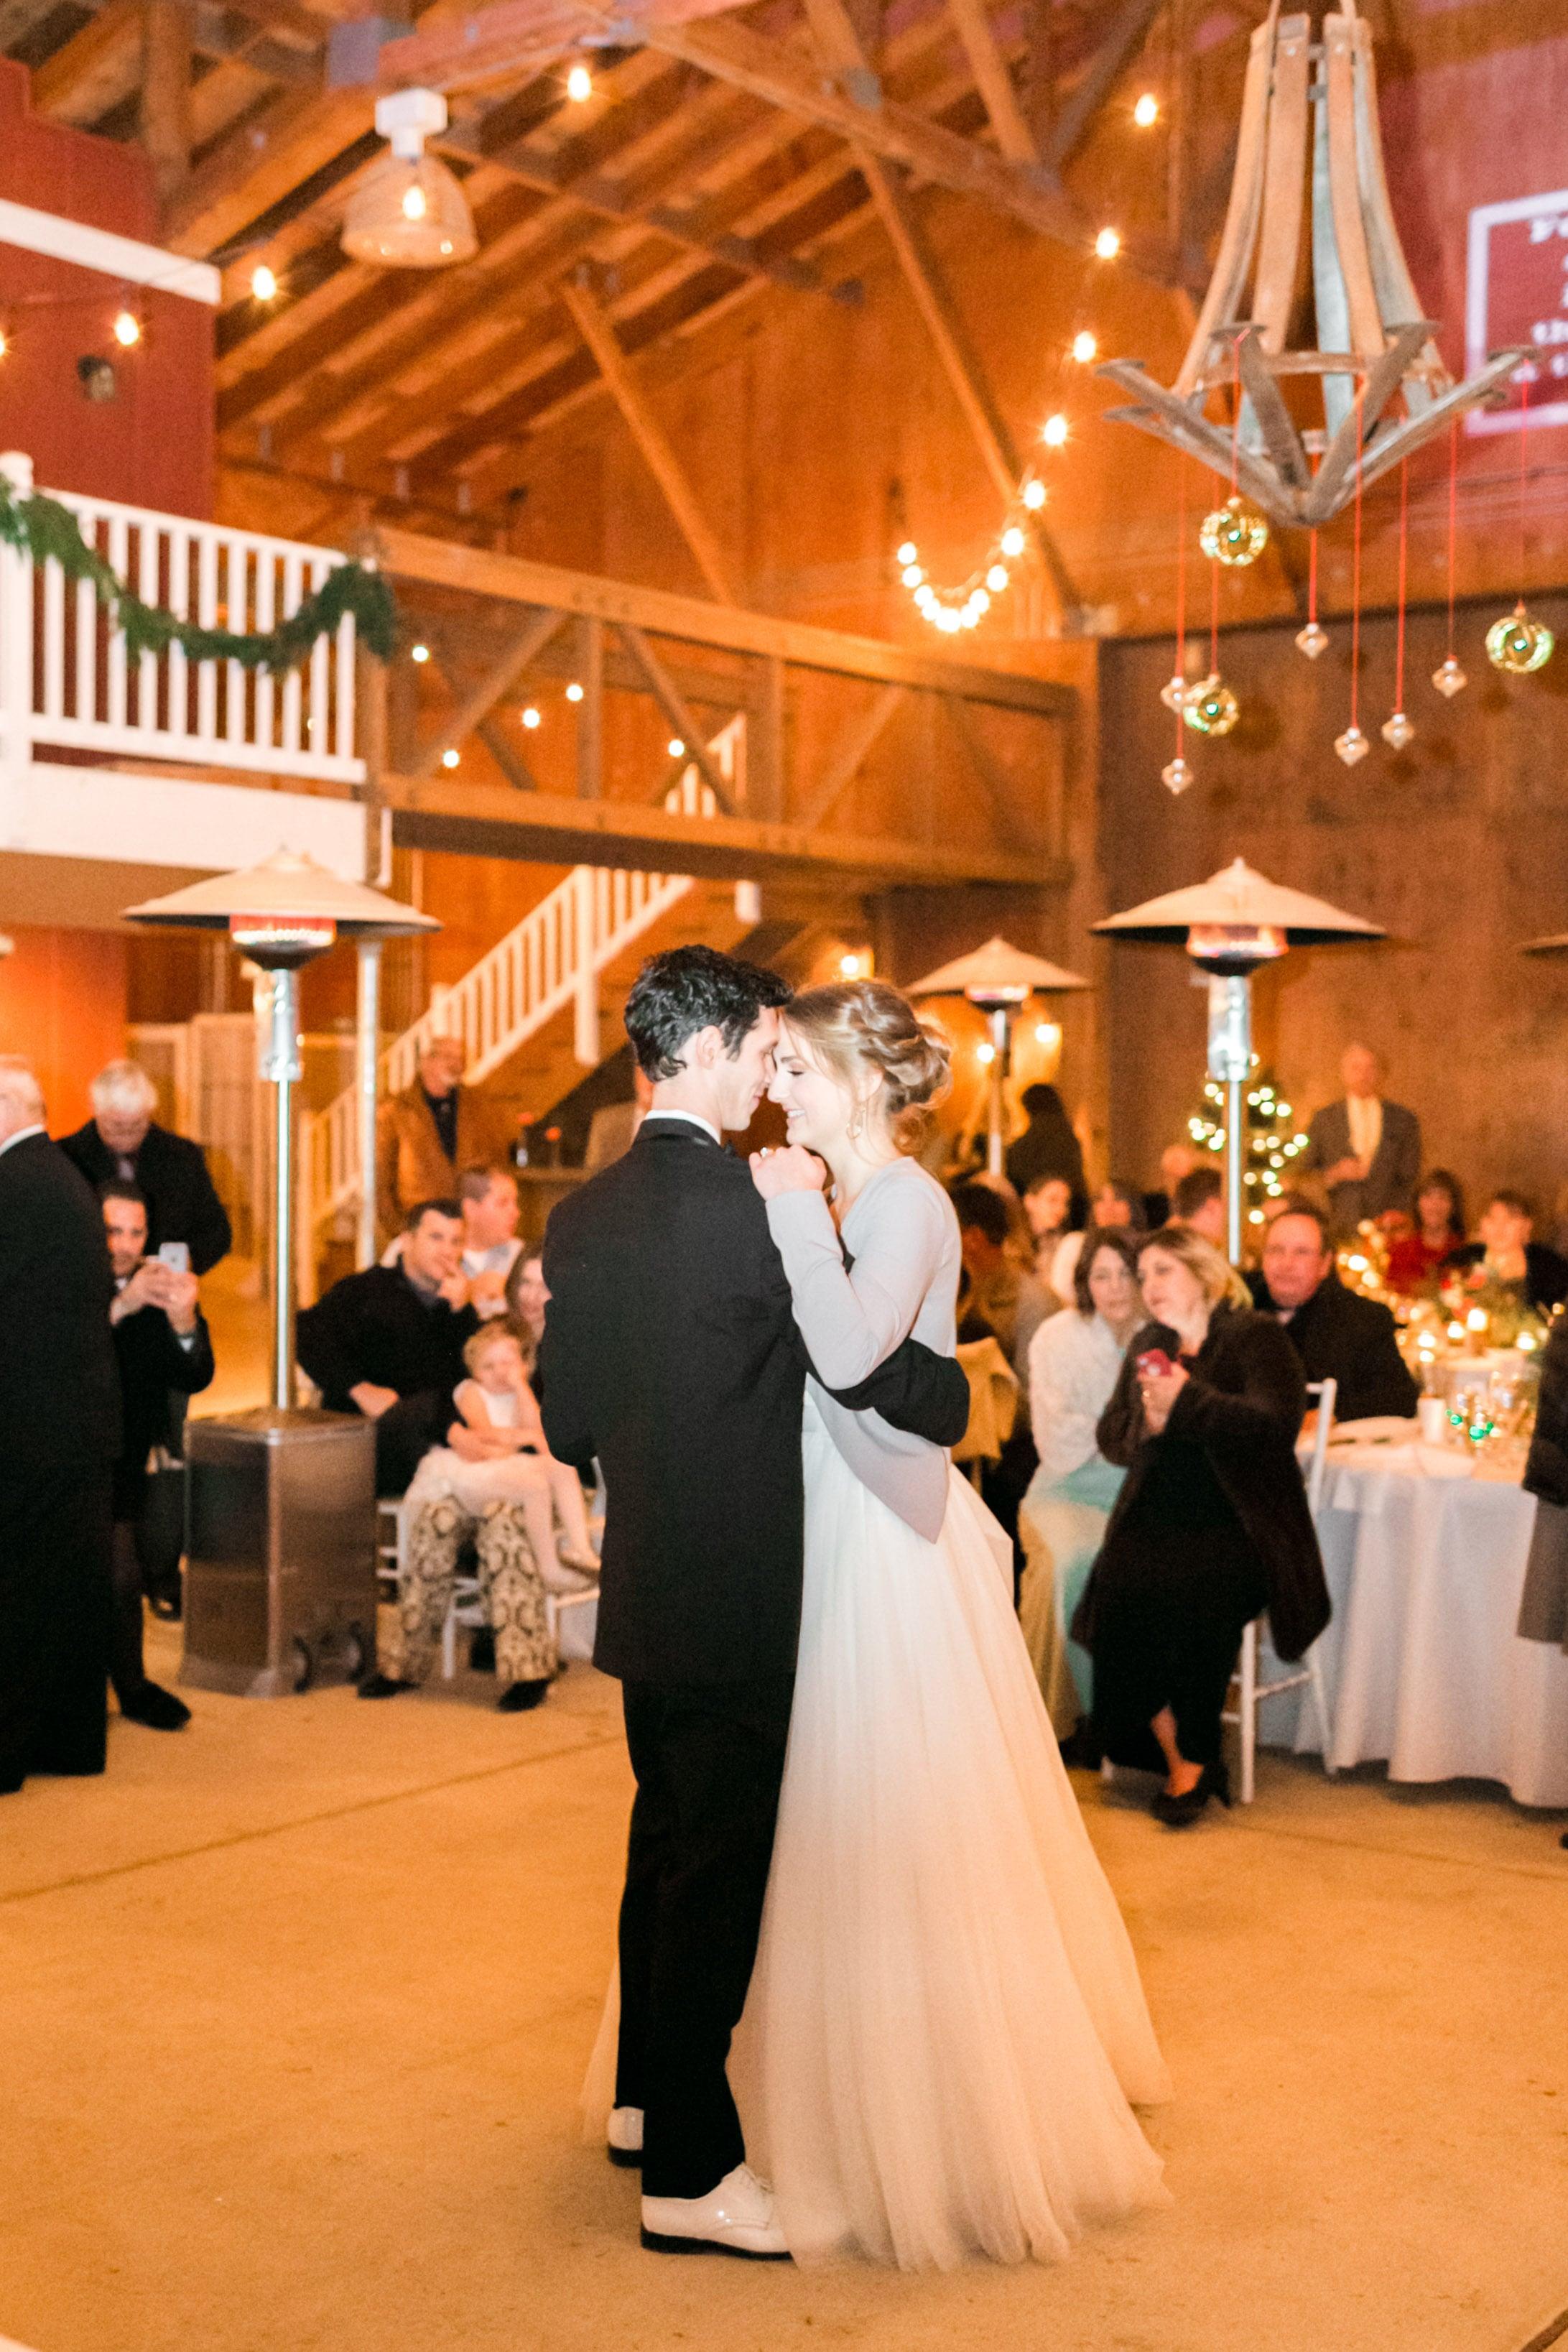 Natalie_Schutt_Photography_Winter_Wedding_San_Luis_Obispo-216.jpg